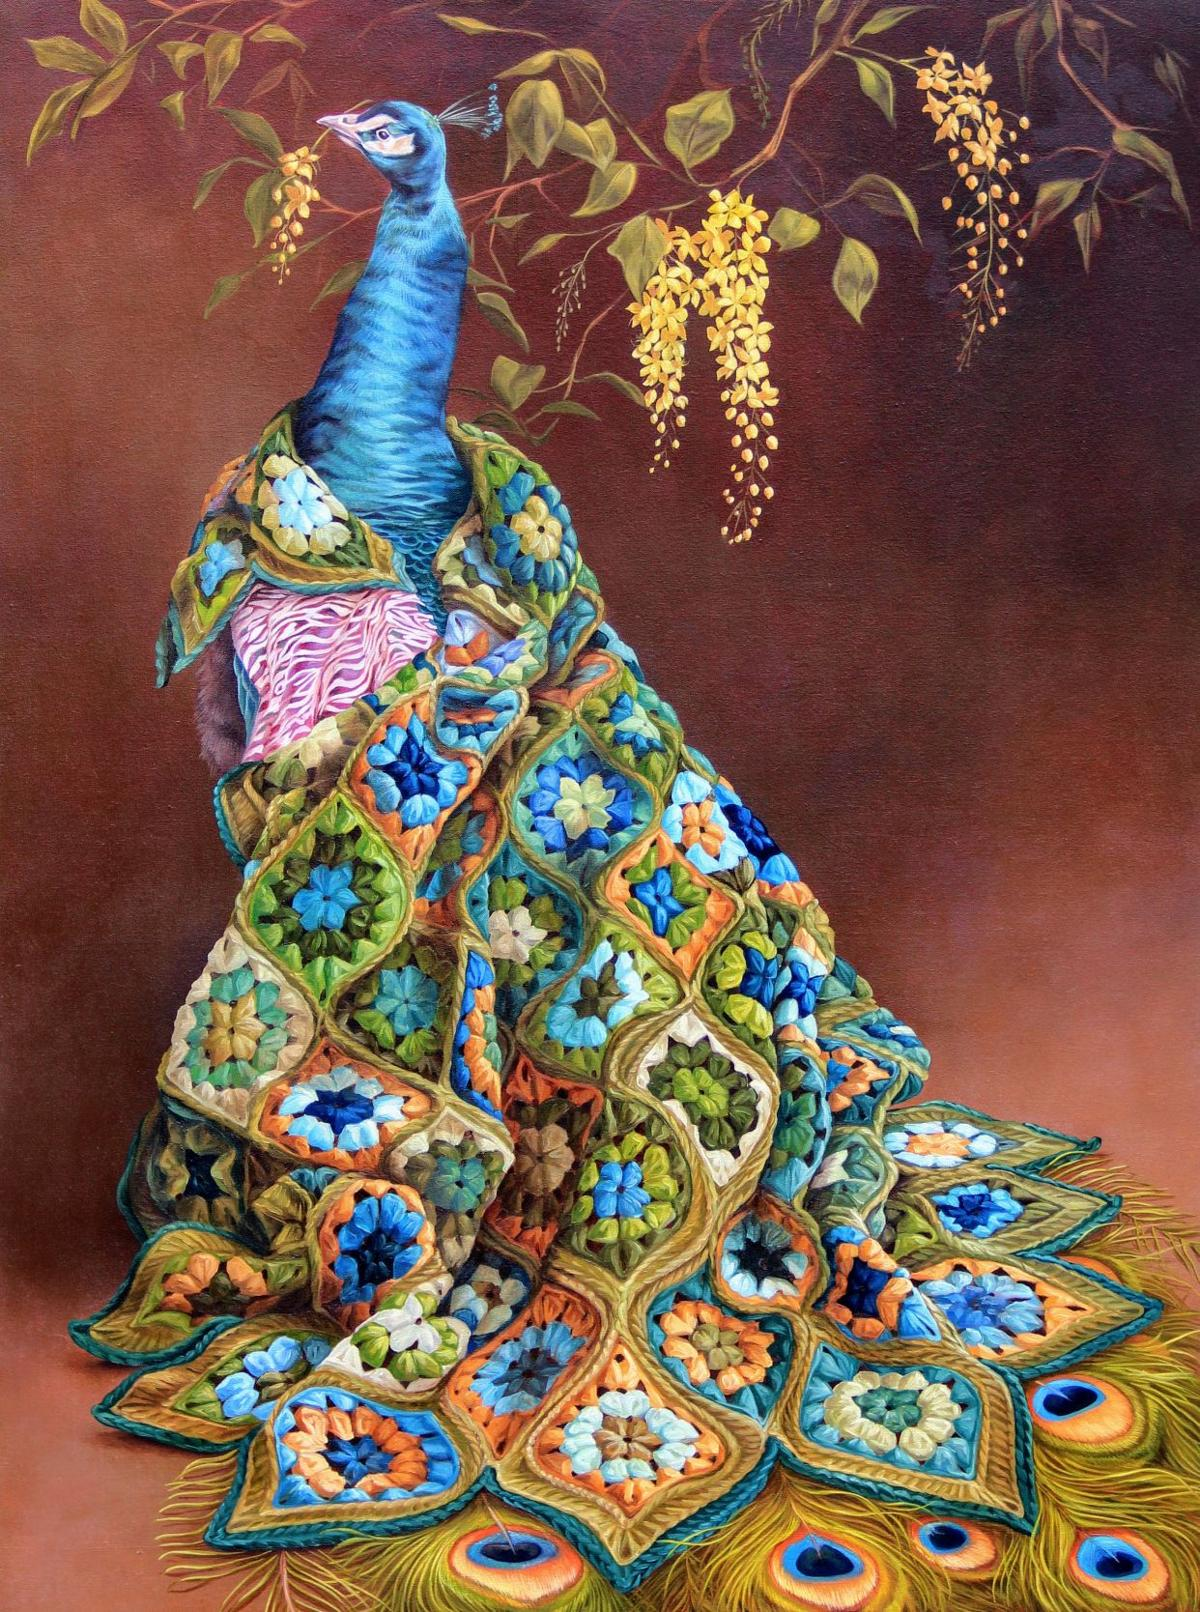 Malia Wiley's Peacock